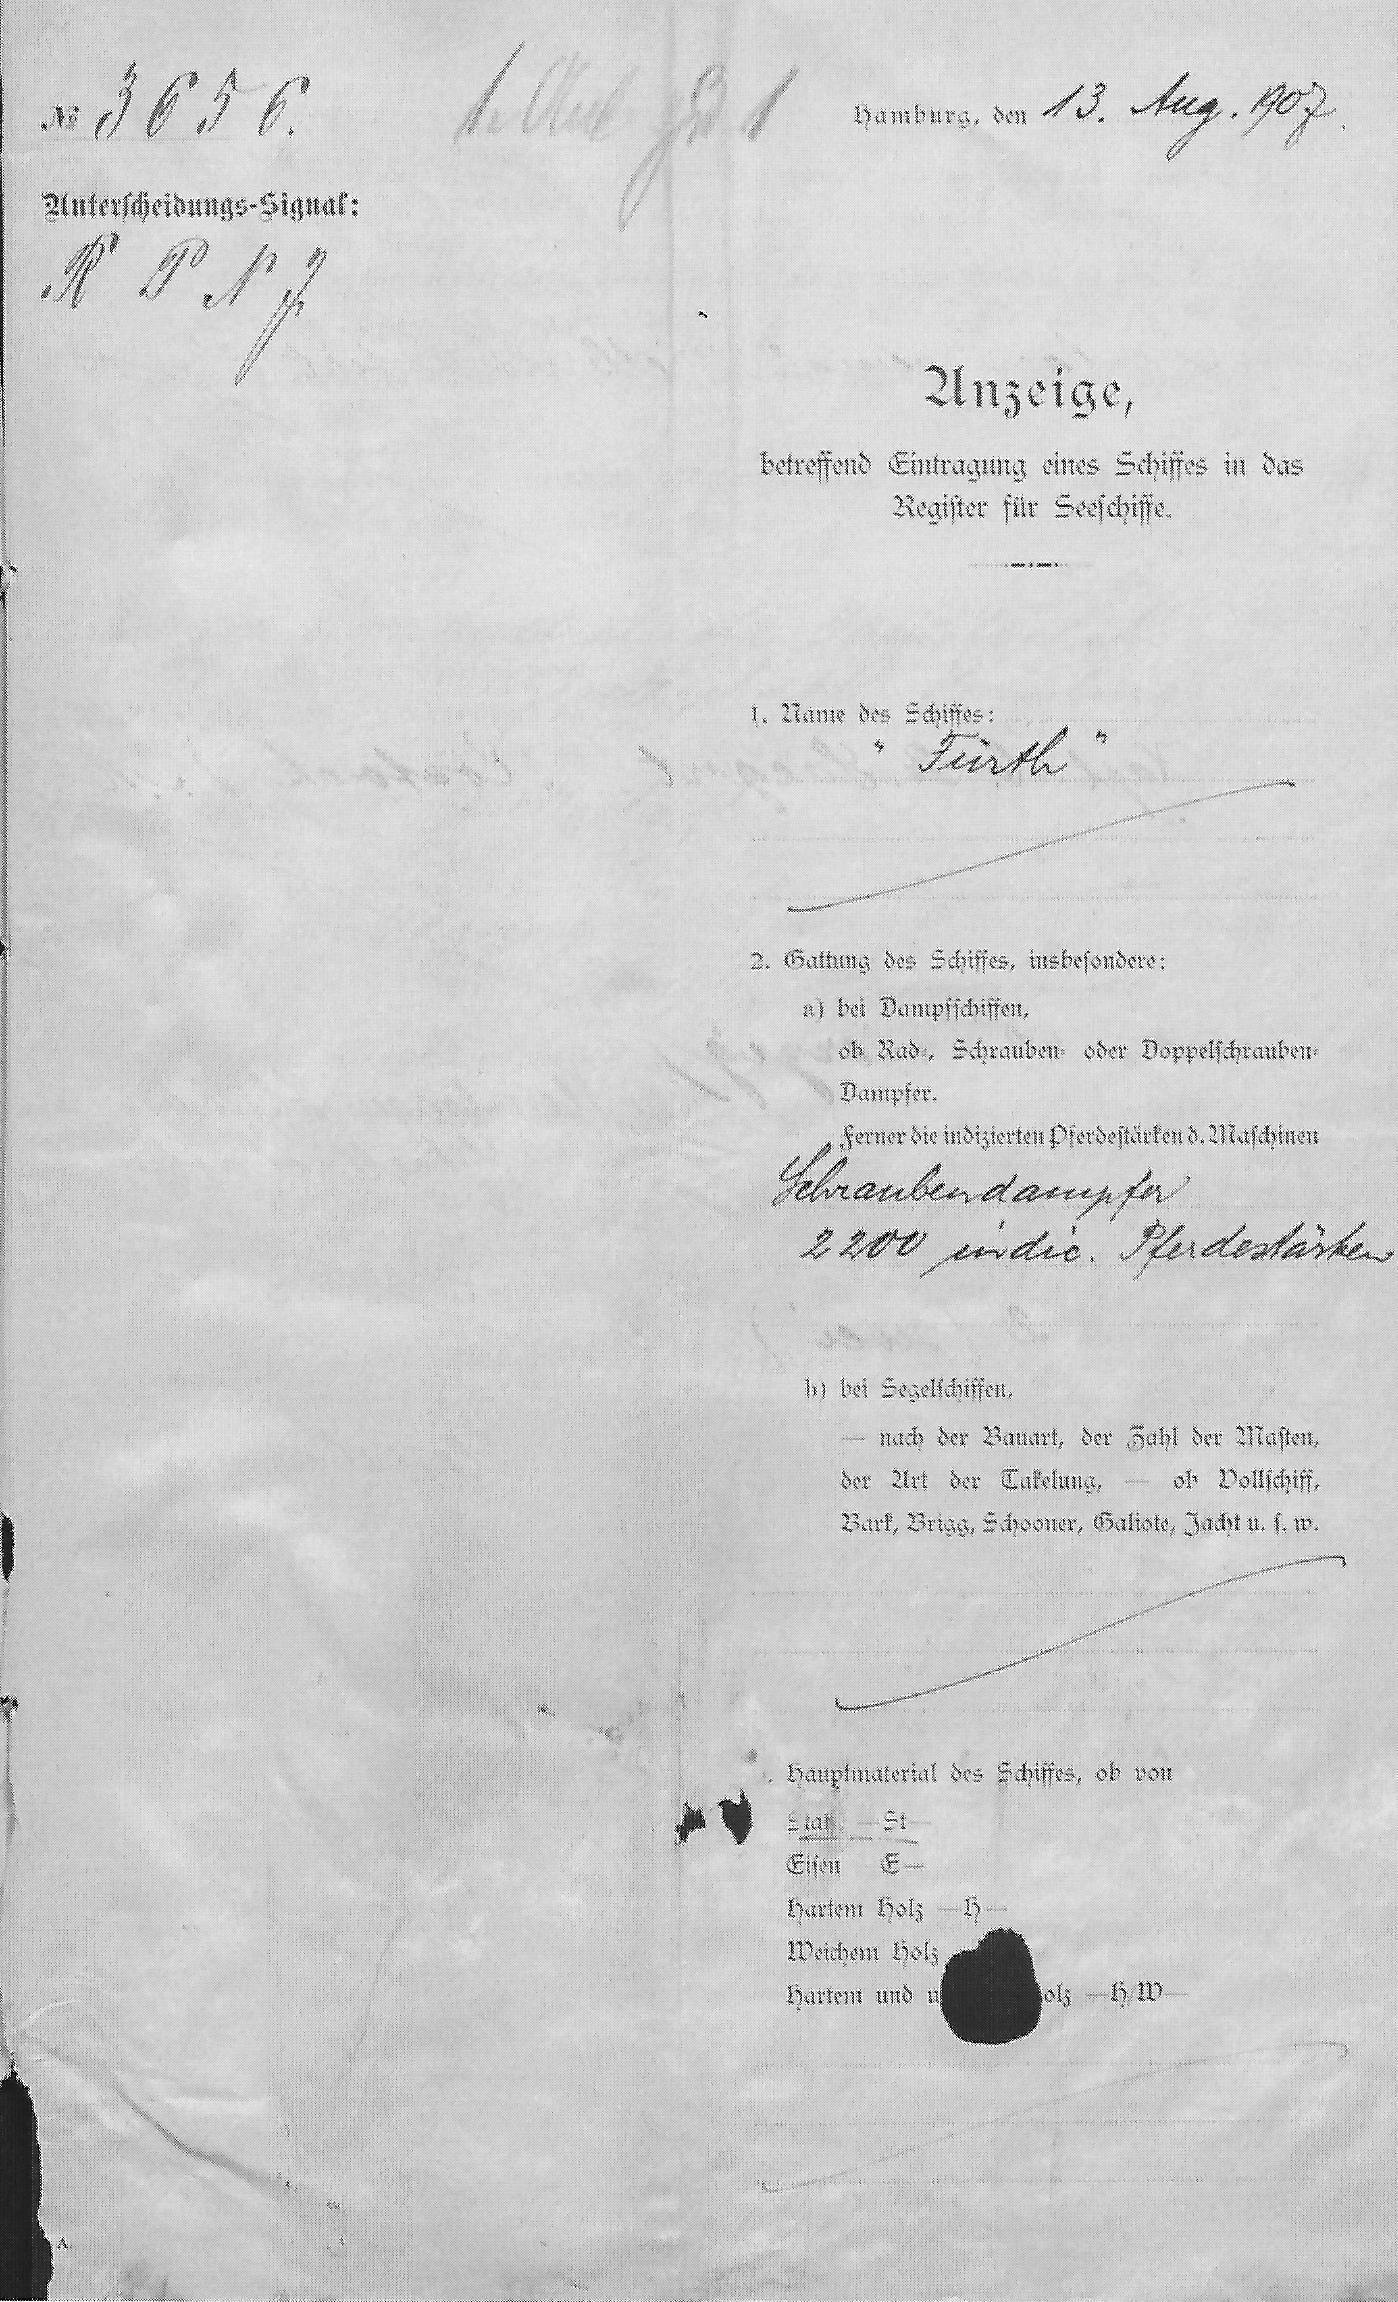 steam ship Furth, registration documents, Hamburg